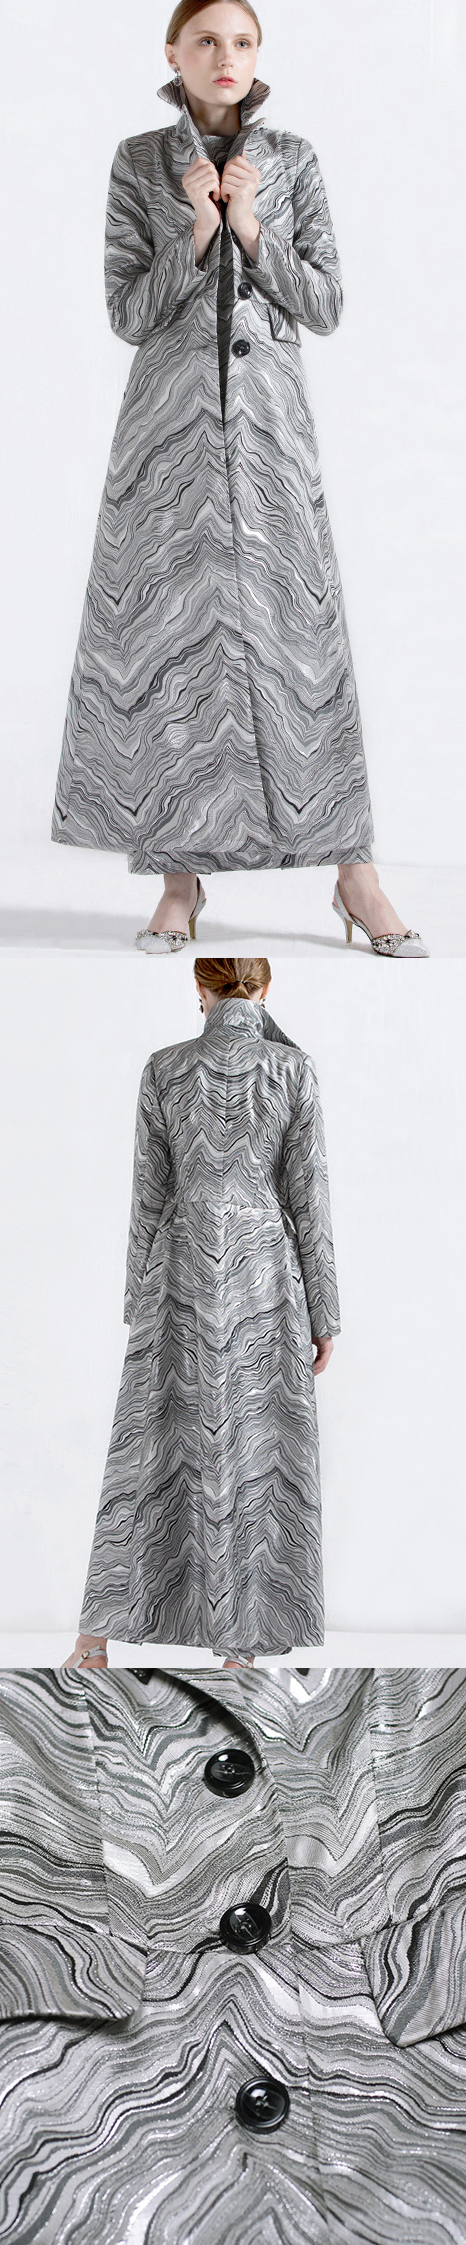 women elegant cotton blended long coats striped lapel collar